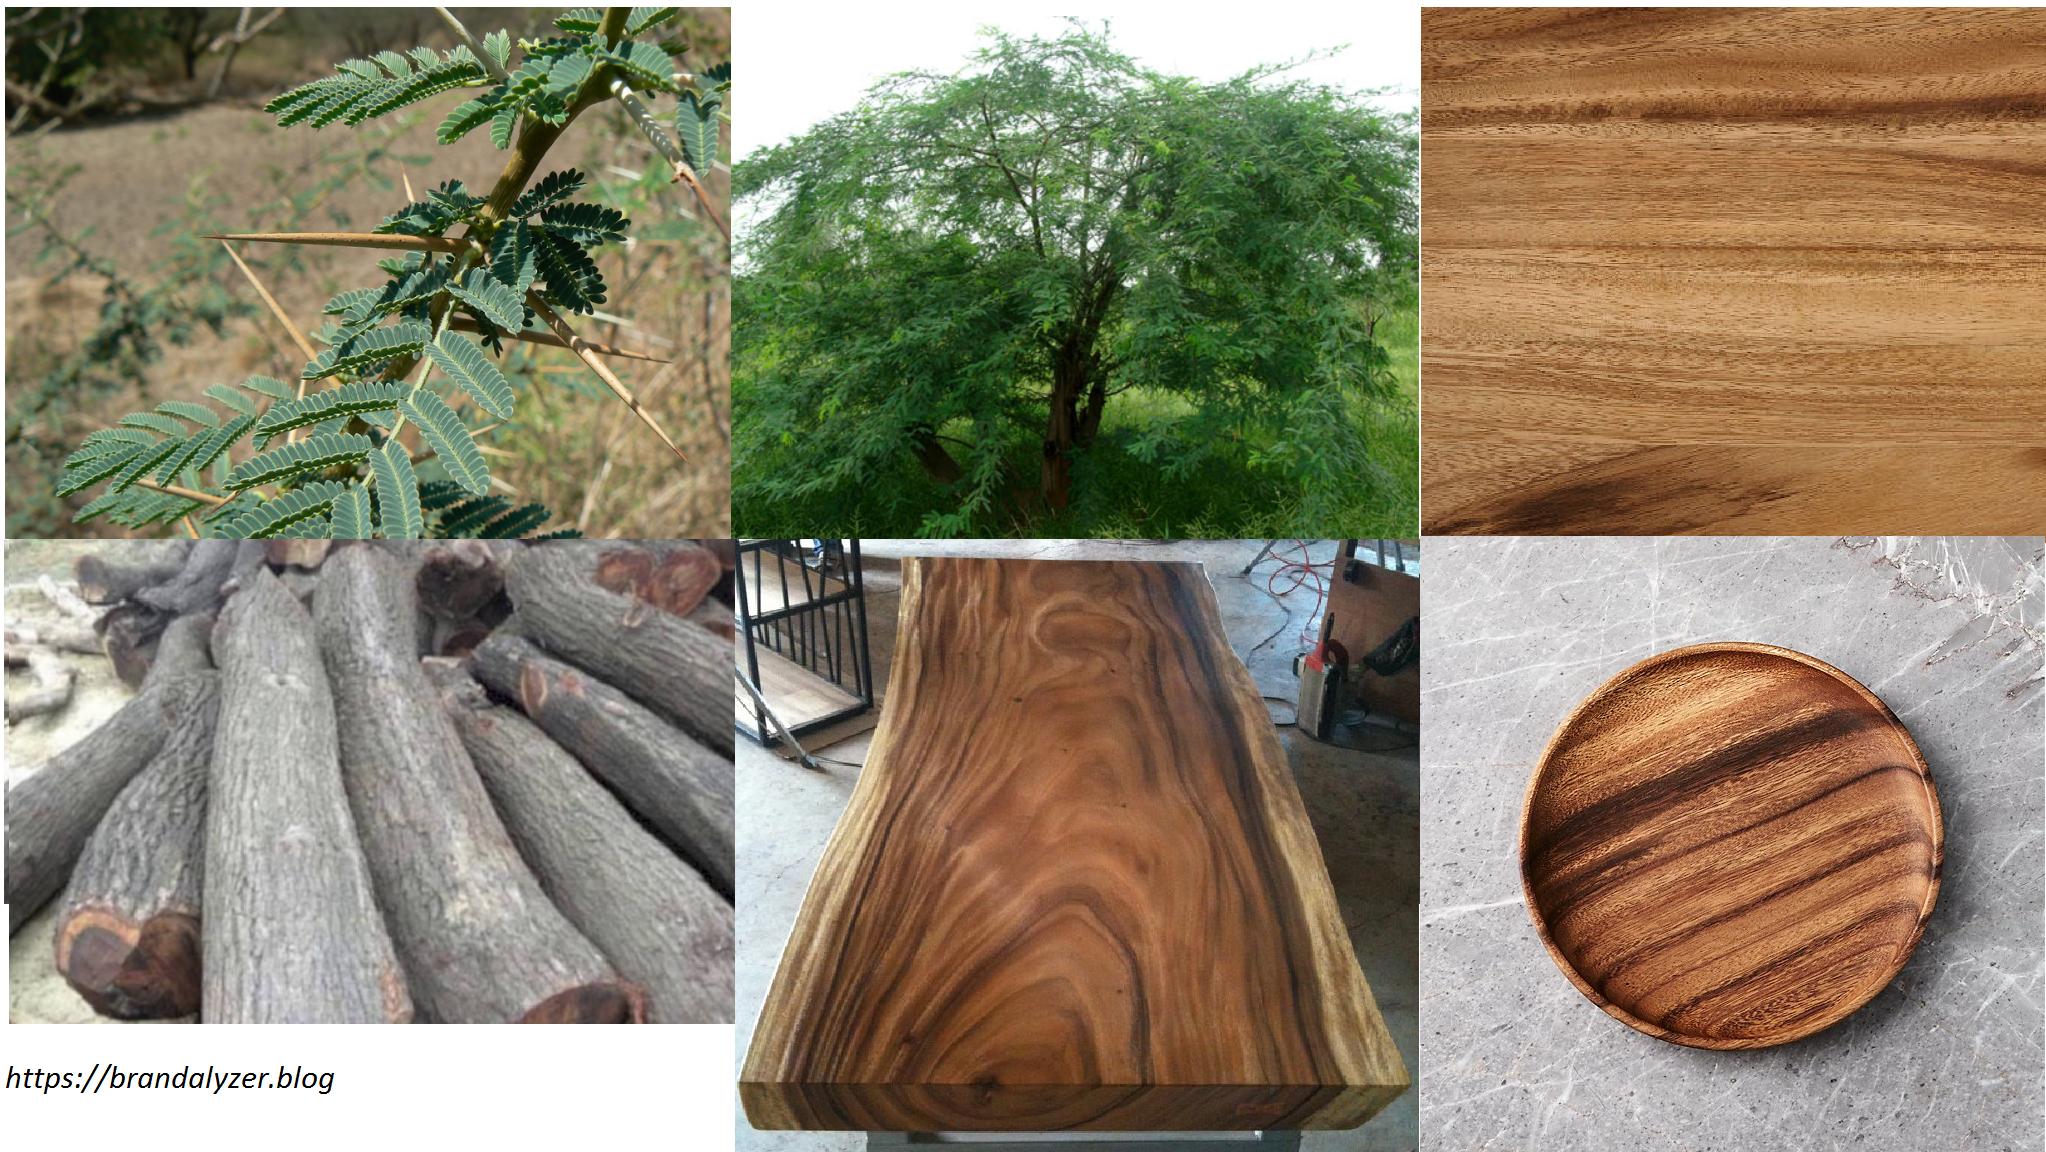 Acacia Vs Teak Wood And Straight Grain Vs Interlocked